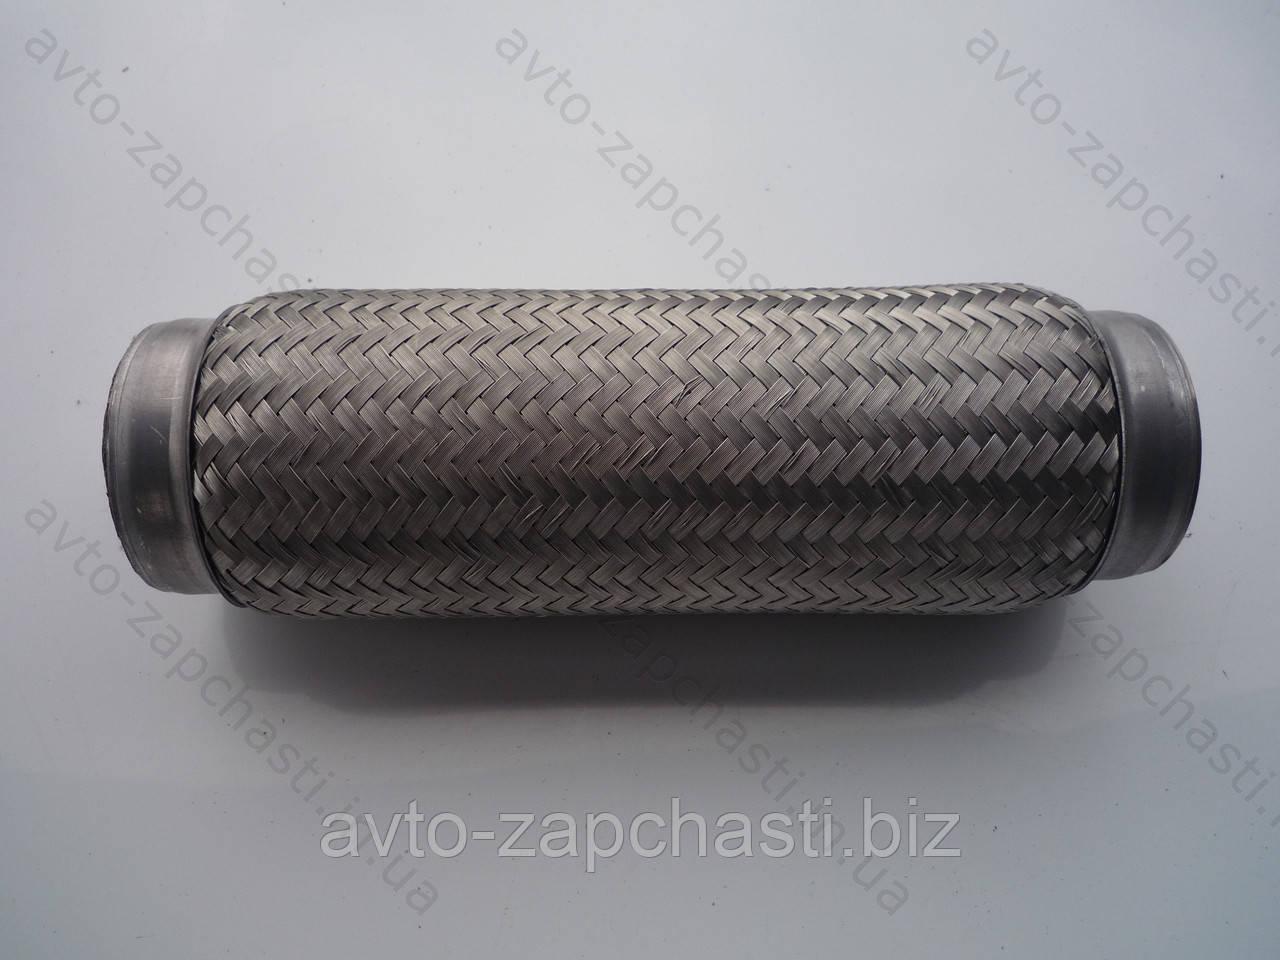 Гофра 75х300  (3-х слойная, длинный фланец) (пакет) (CL  75x300)